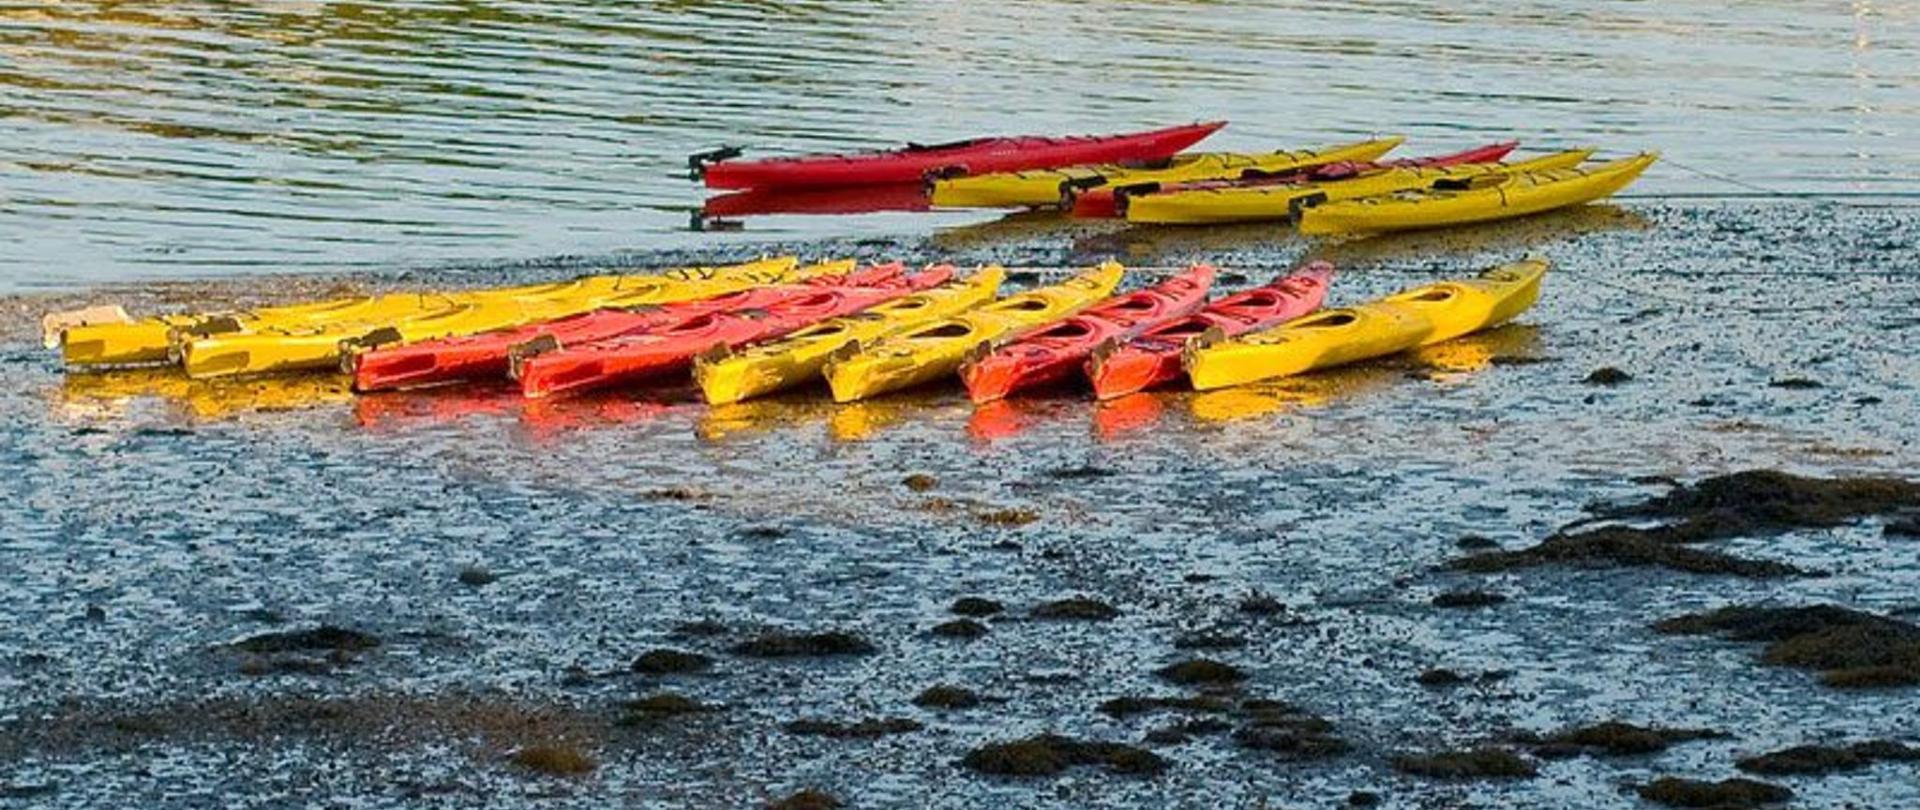 Kayaking Activities.jpg